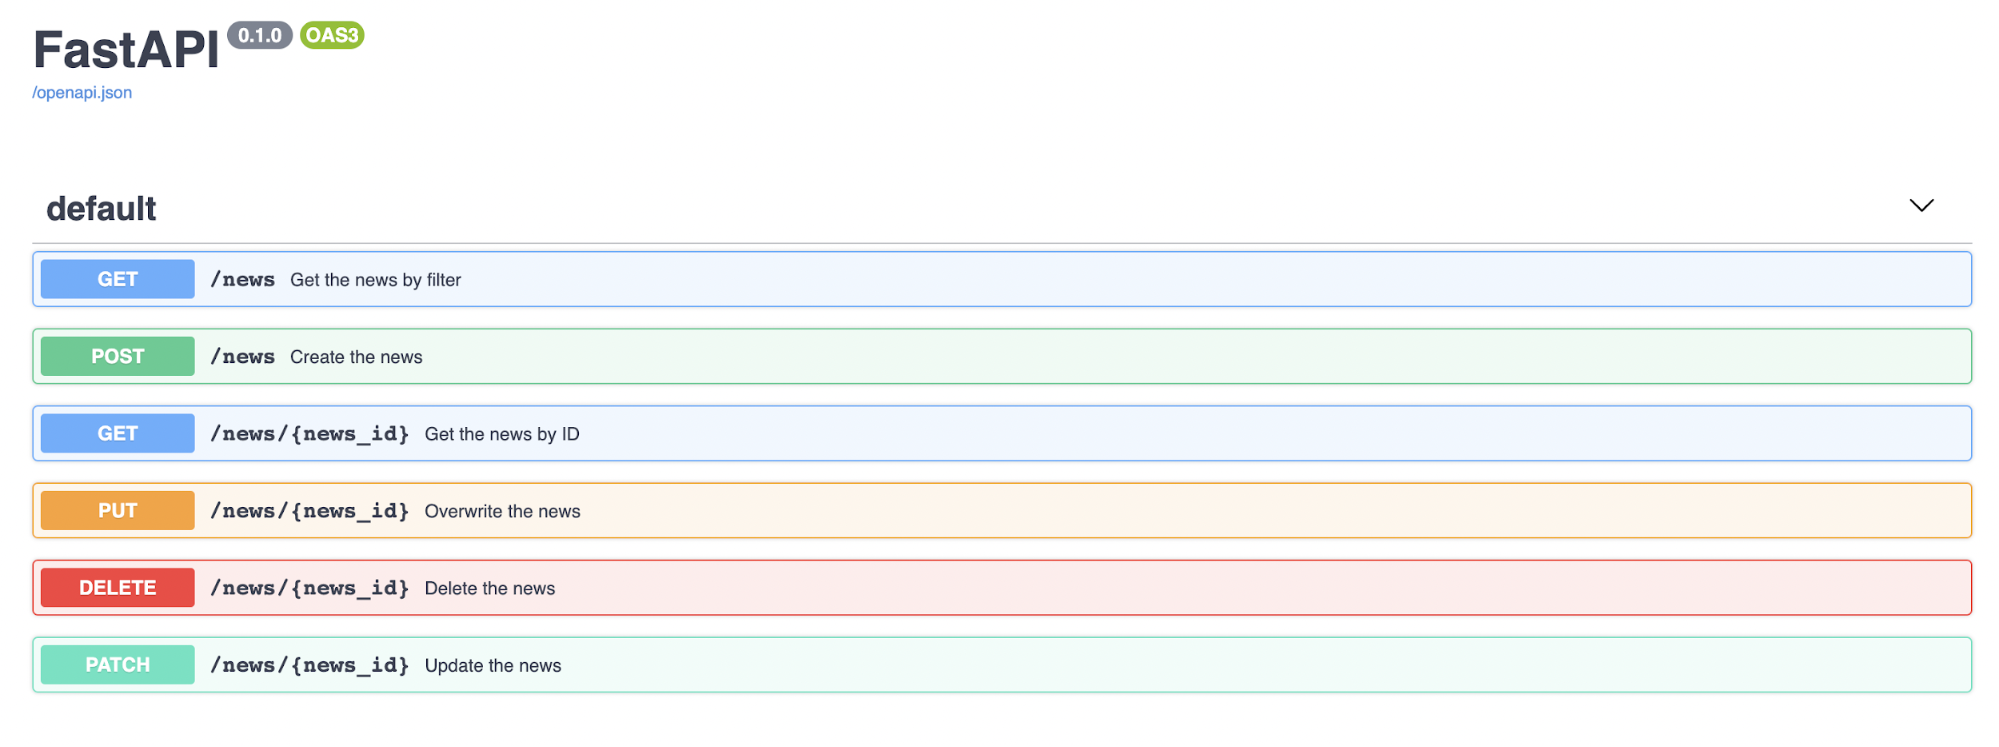 Automatic documentation - SwaggerUI